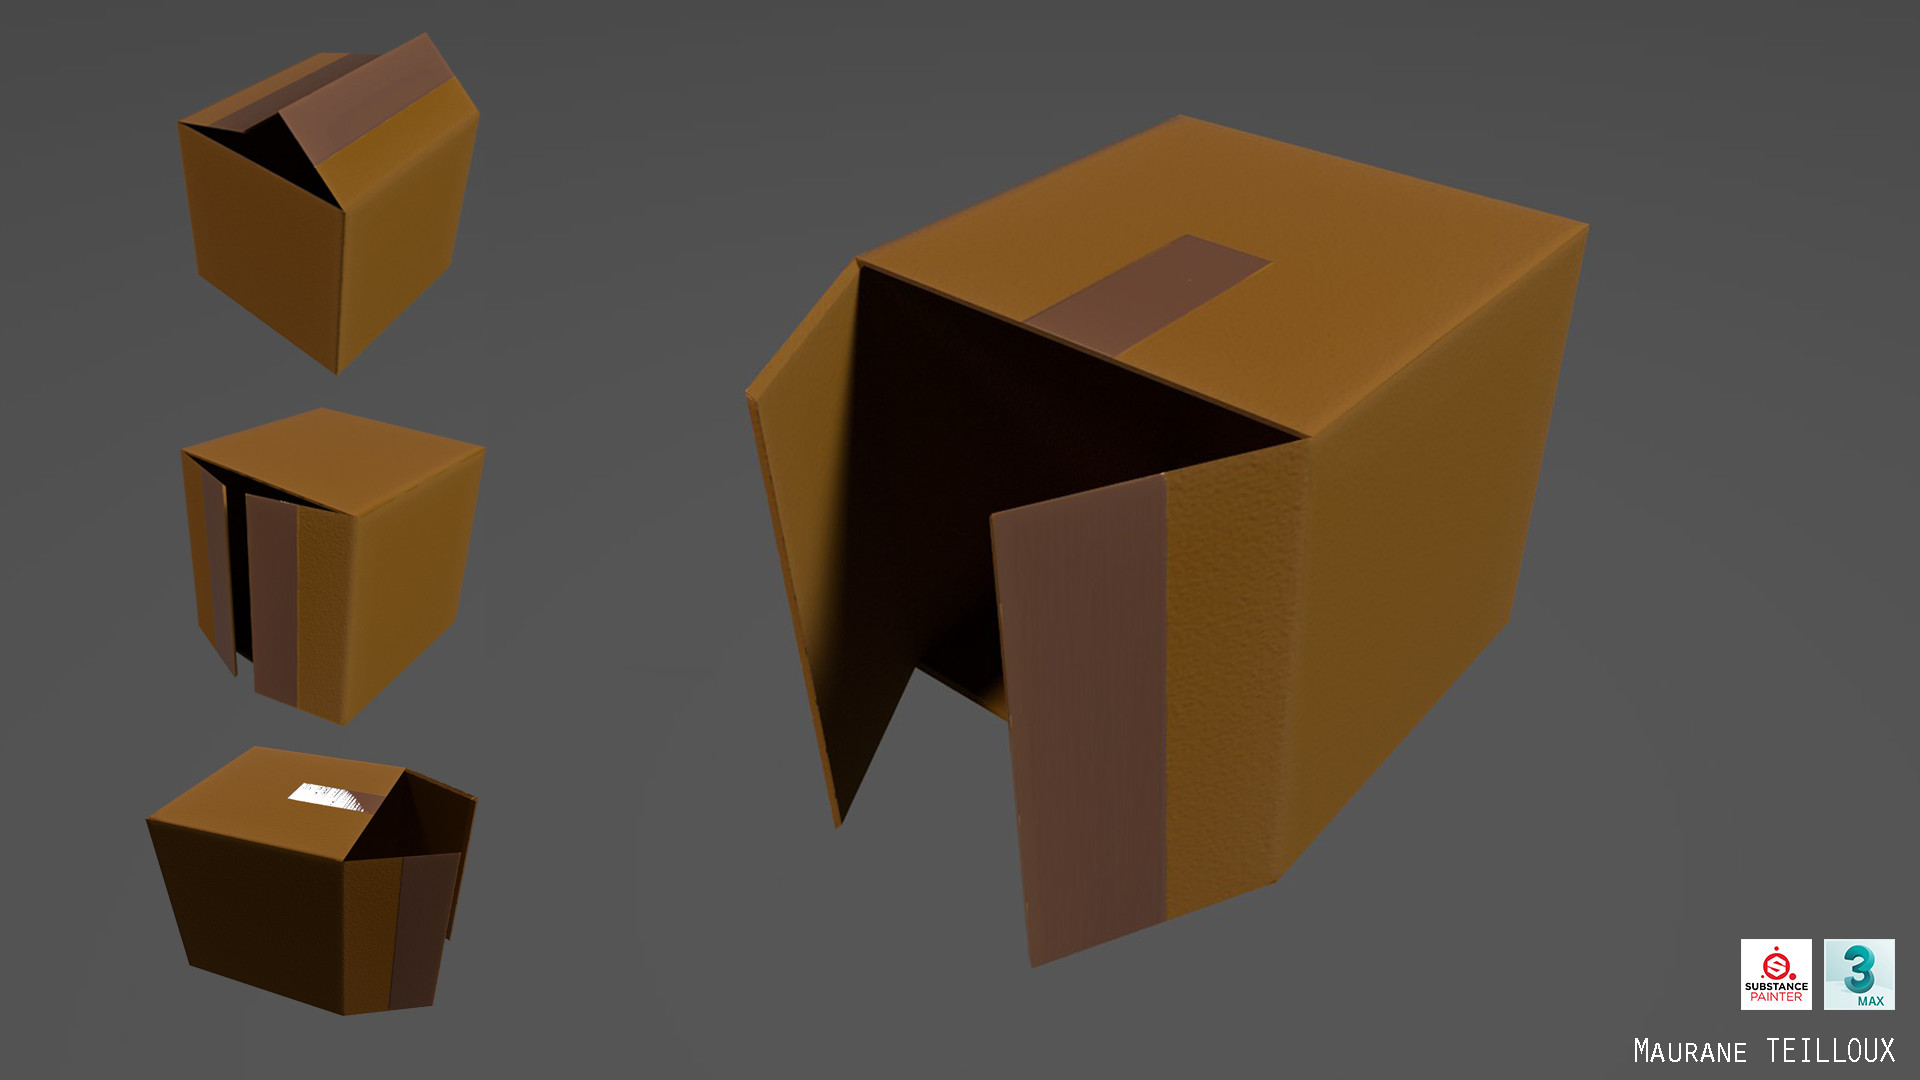 Maurane teilloux cartons